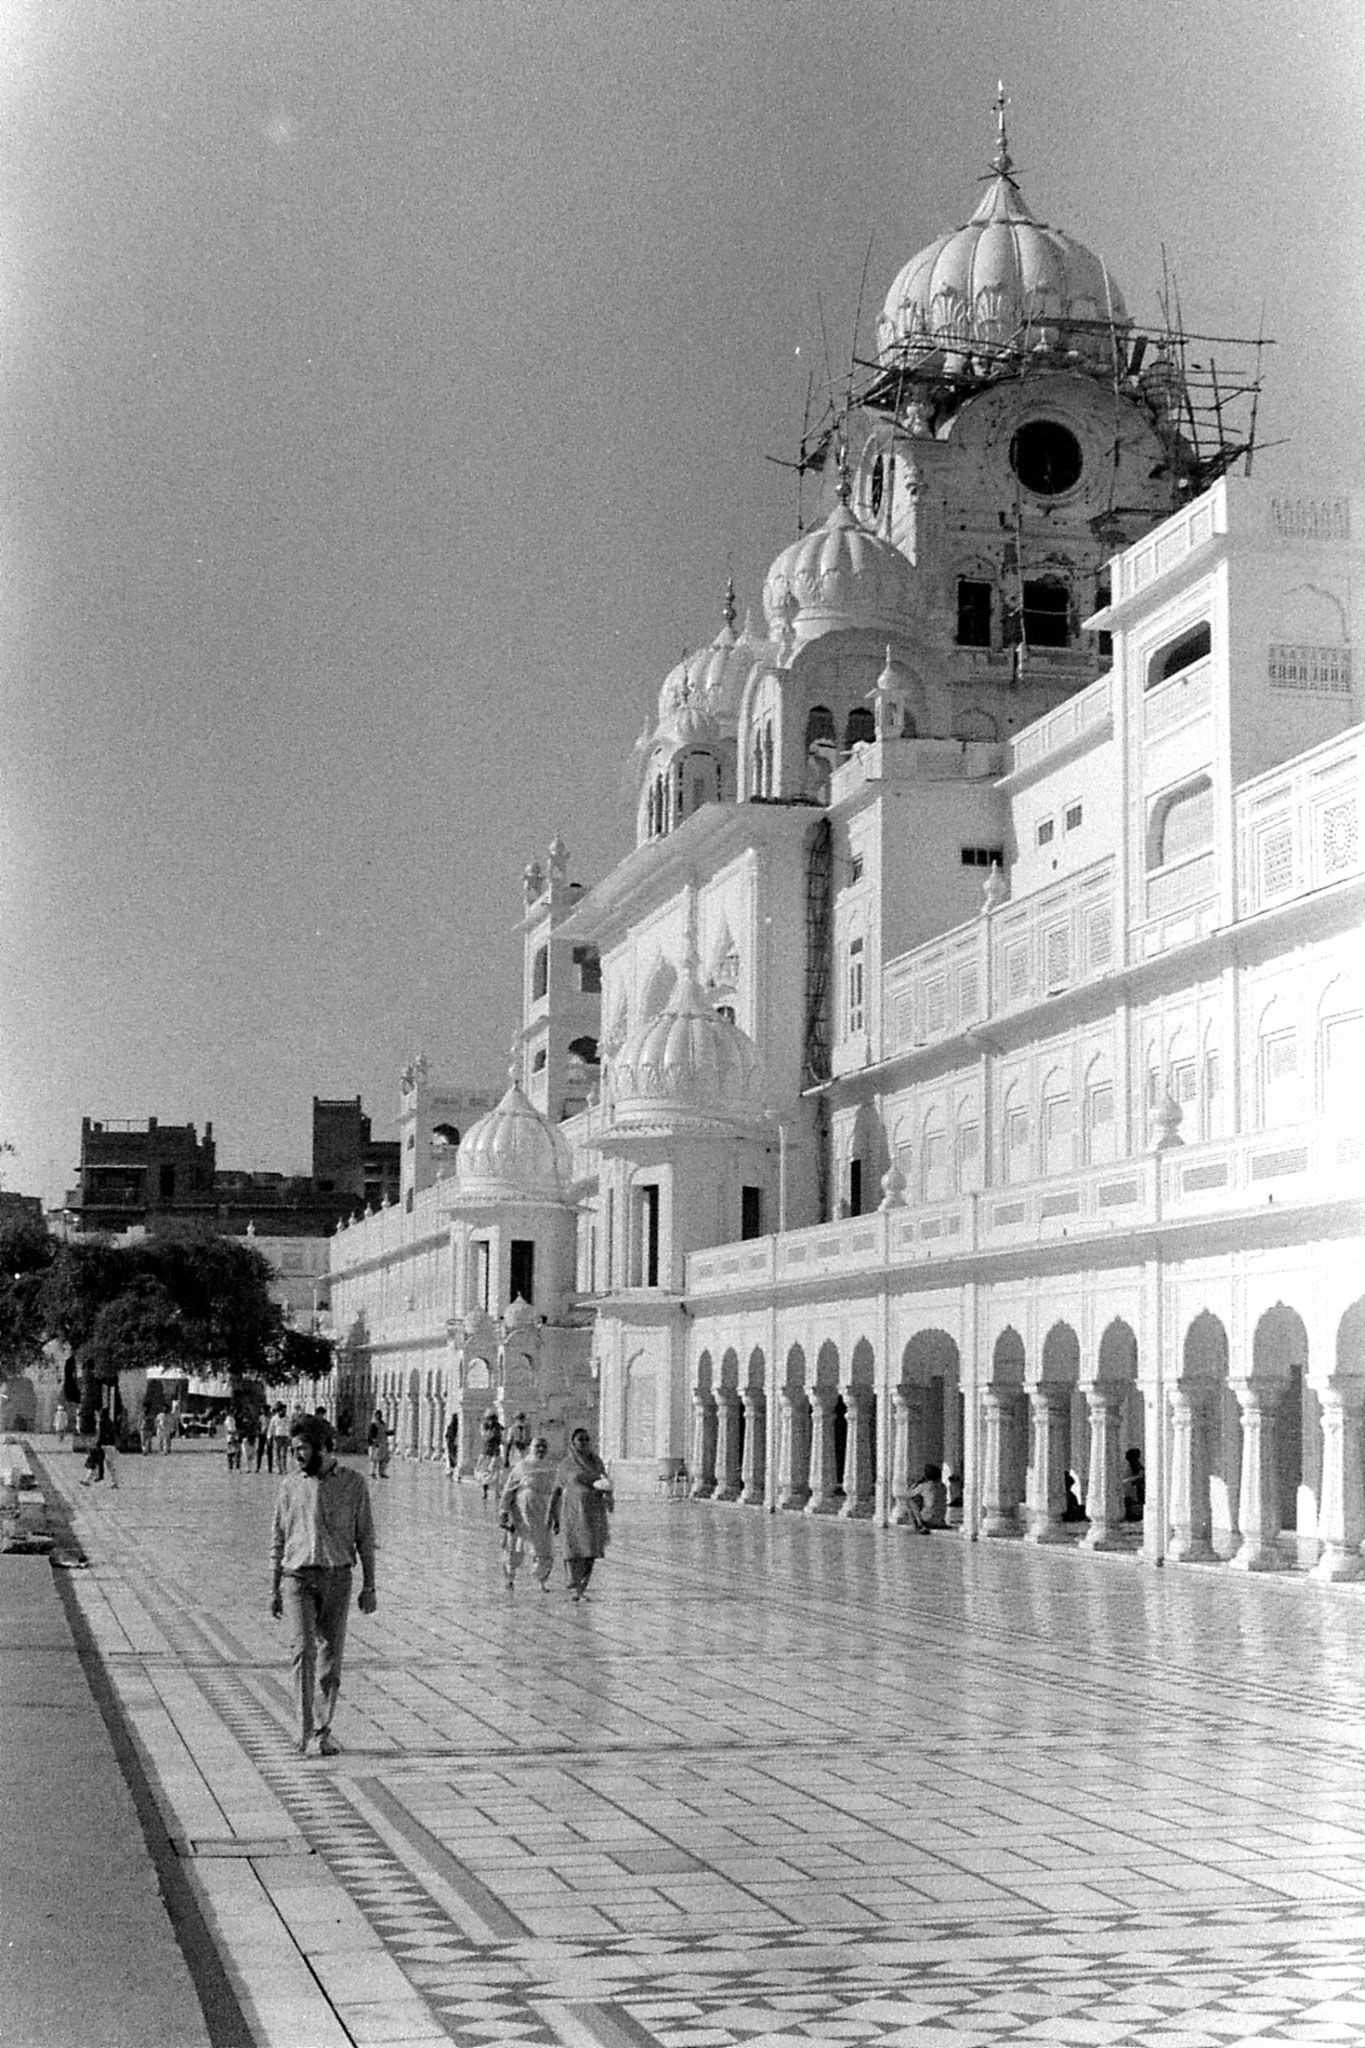 17/11/1989: 4: Amritsar Golden Temple